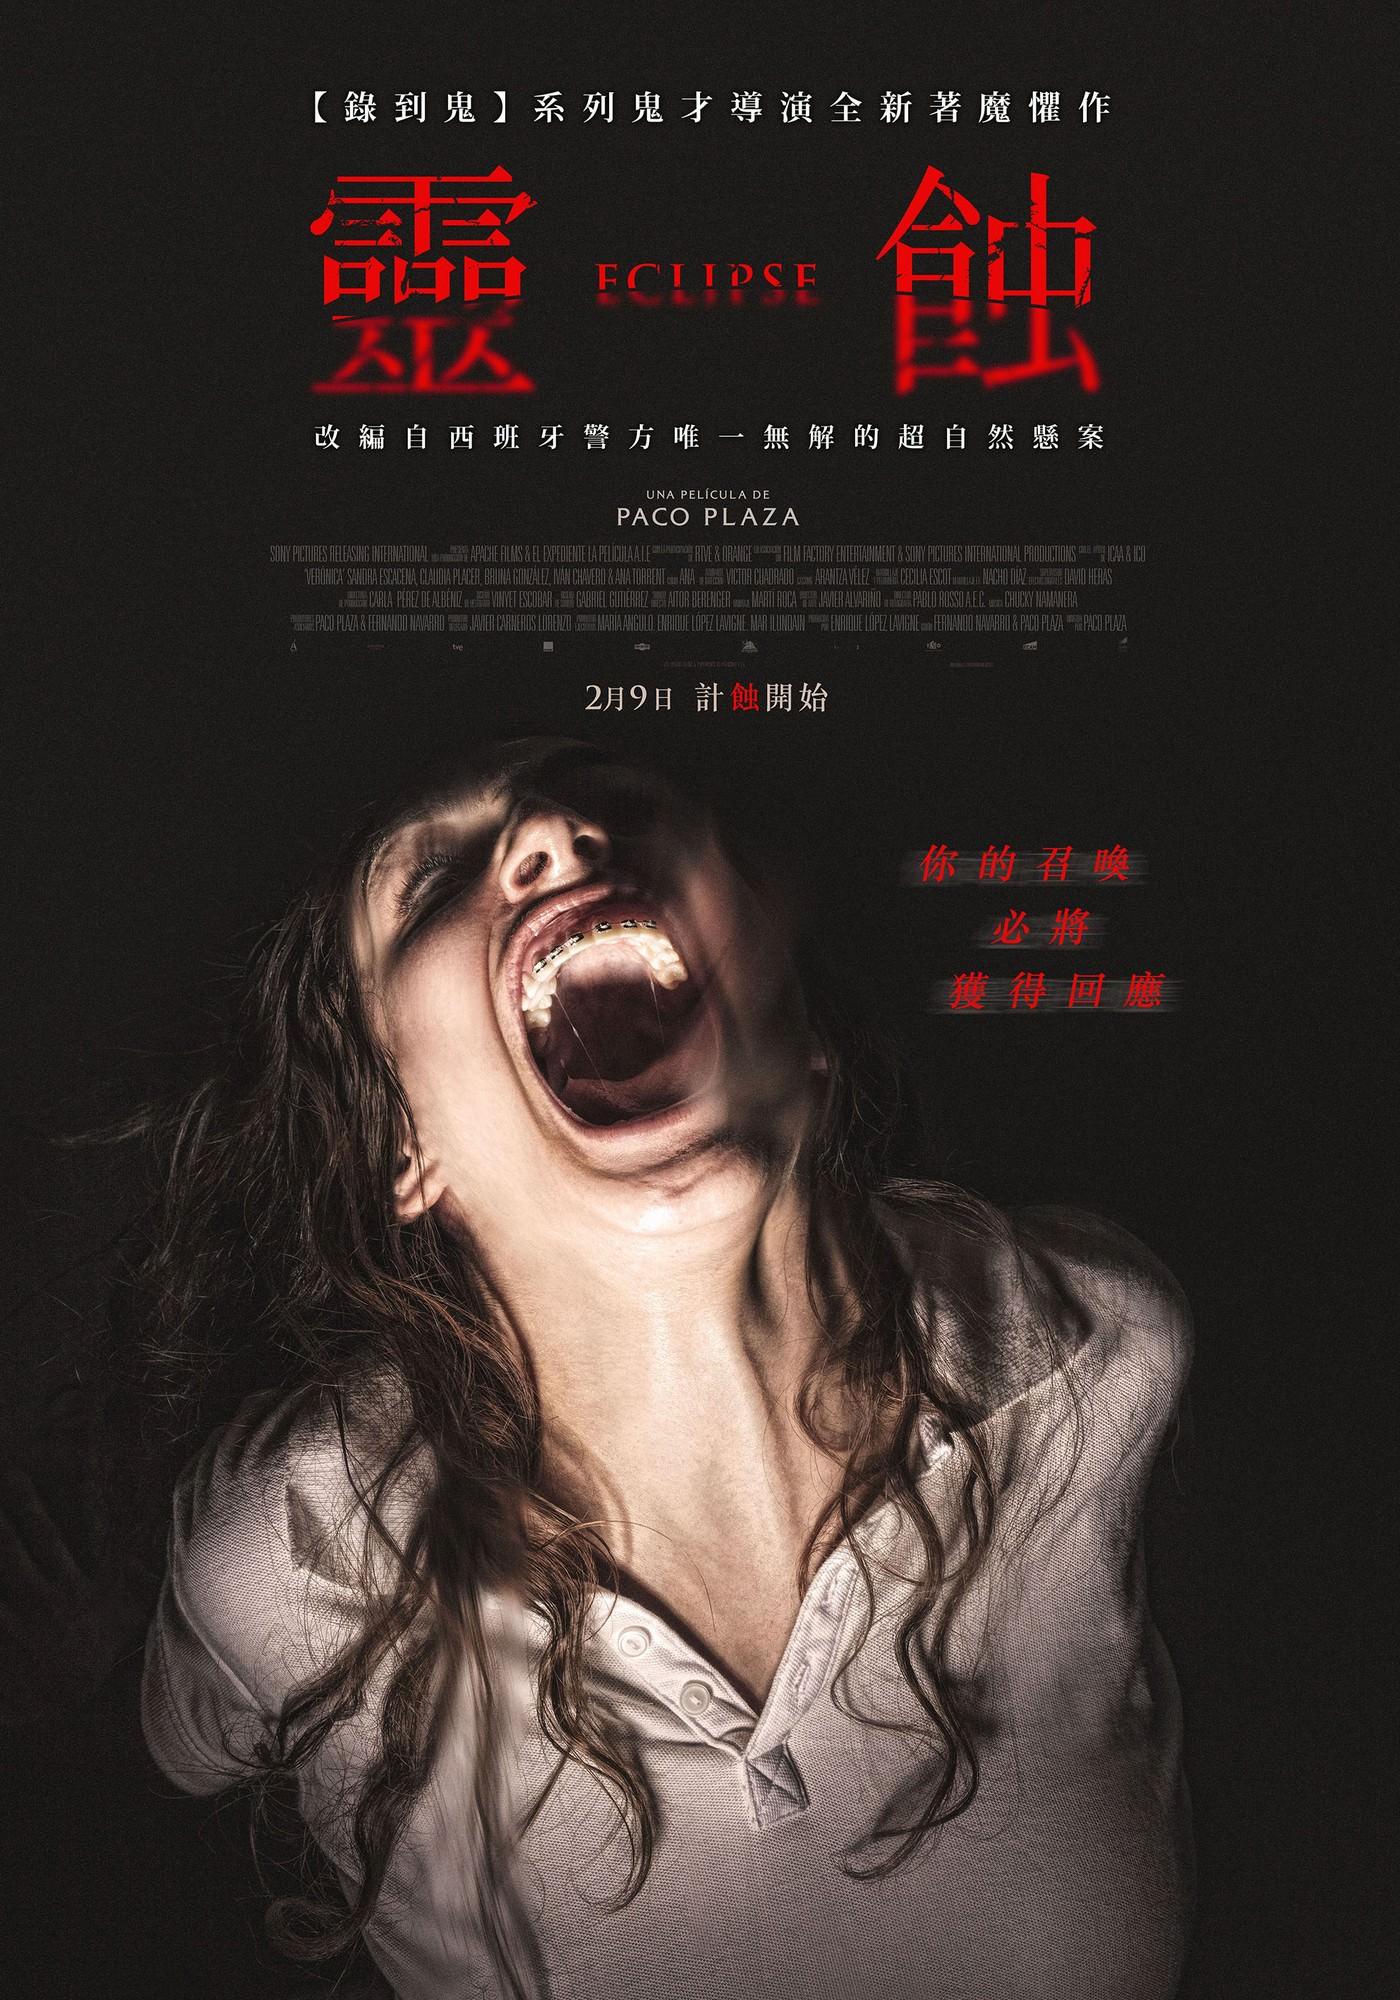 Movie, Verónica(西班牙) / 靈蝕(台) / Eclipse(英文), 電影海報, 台灣